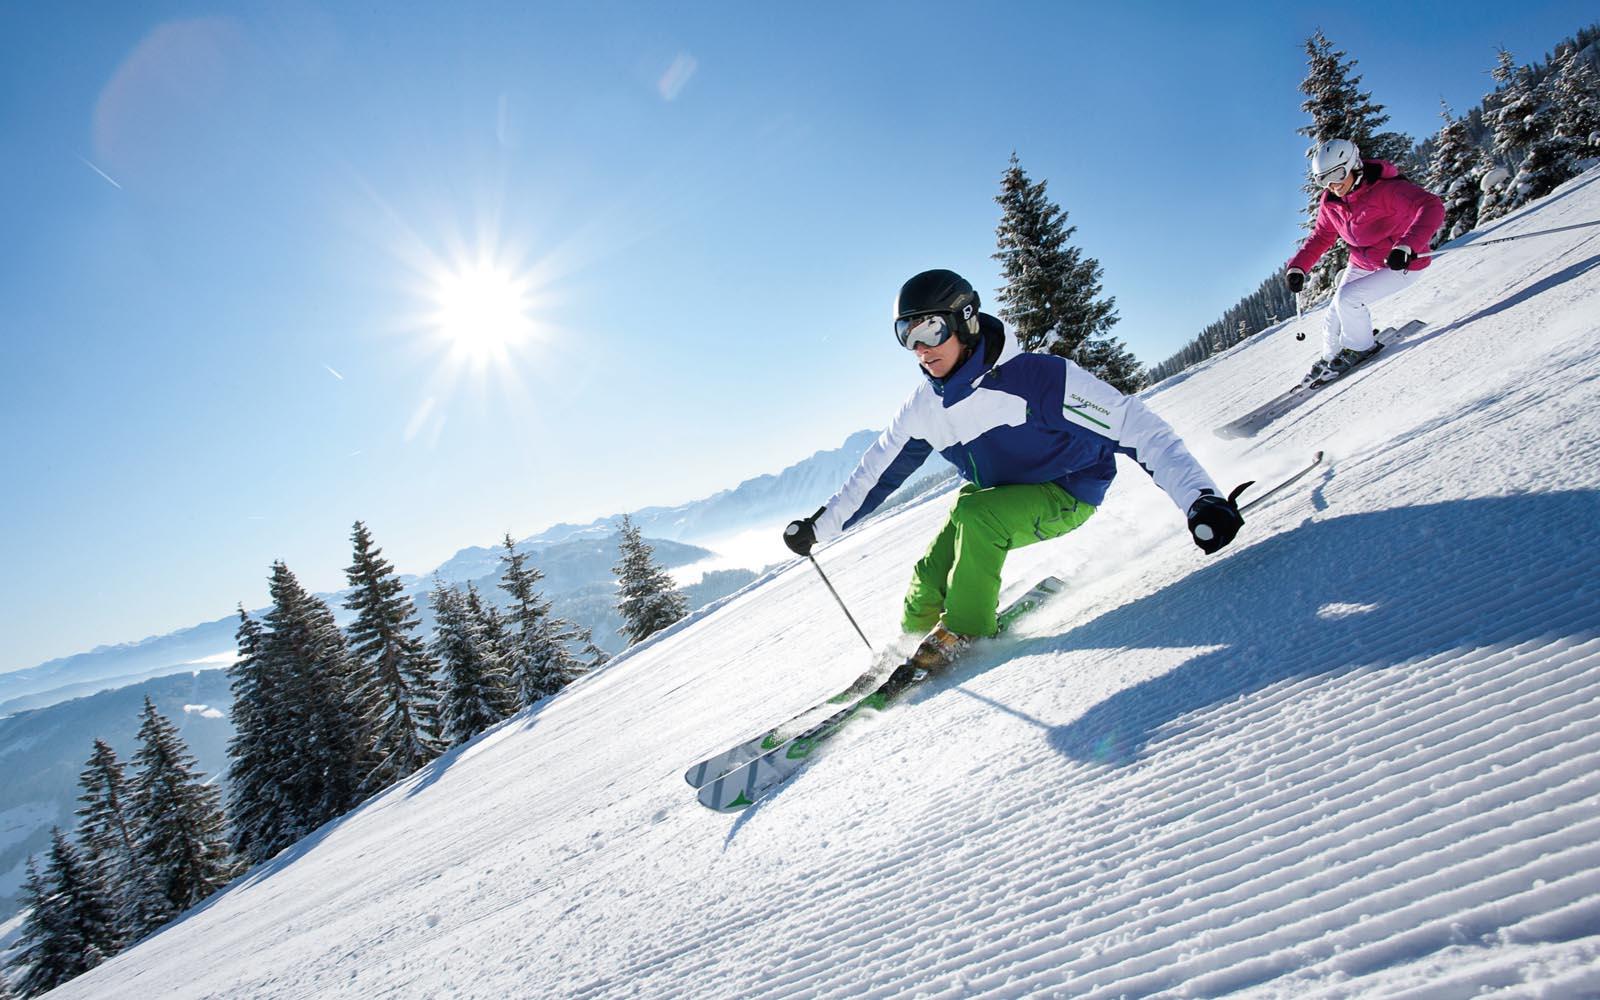 Skifahren foto slt salzburgerland magazin for Designhotel skifahren